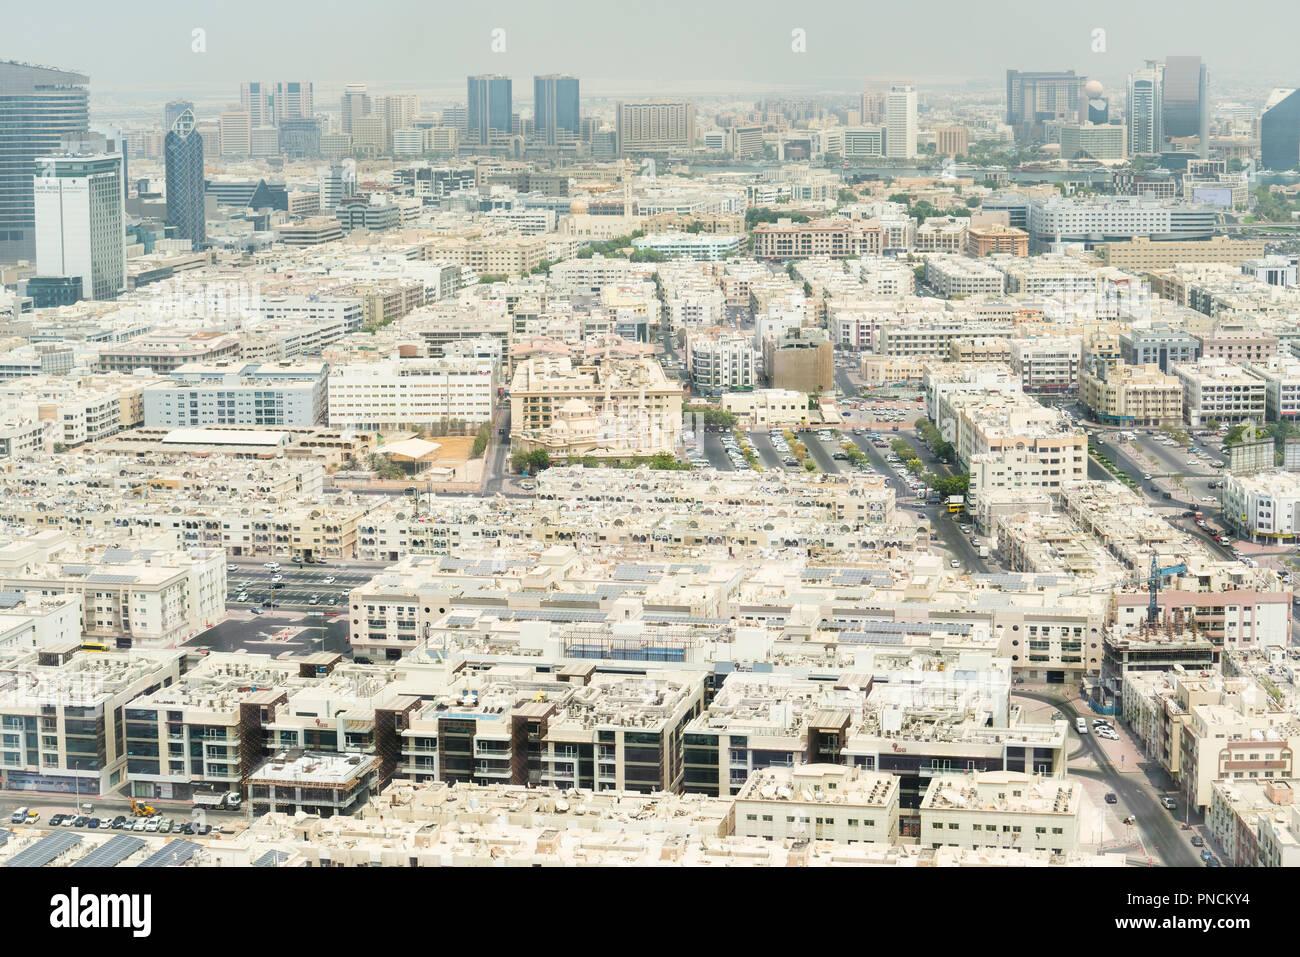 View of low rise housing apartment blocks in Al Karama district of Dubai, UAE - Stock Image